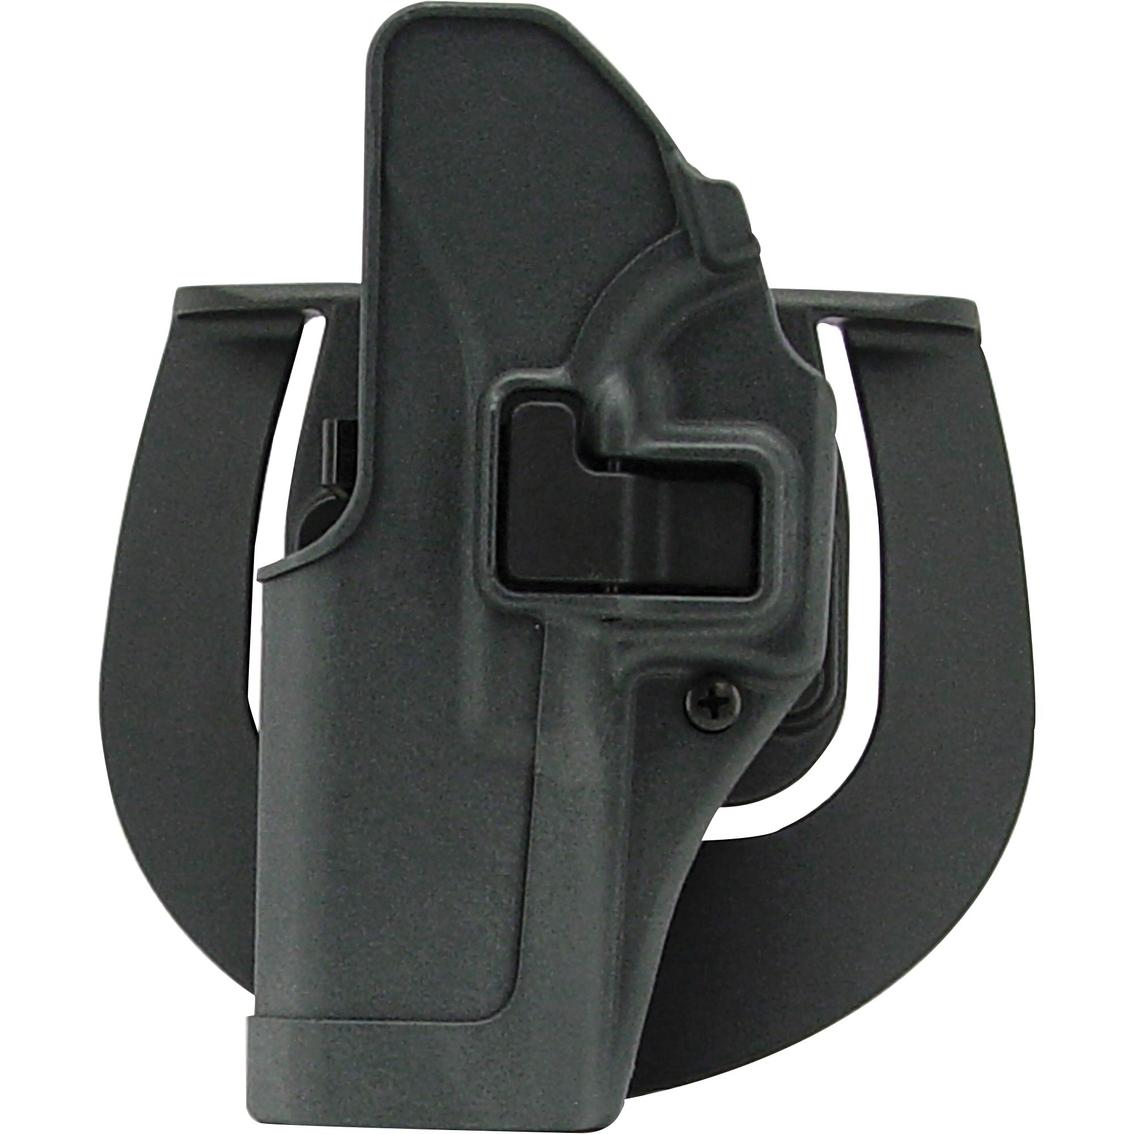 BlackHawk Serpa Sportster Paddle Holster Glock 17 22 31 Polymer Gun Metal Gray